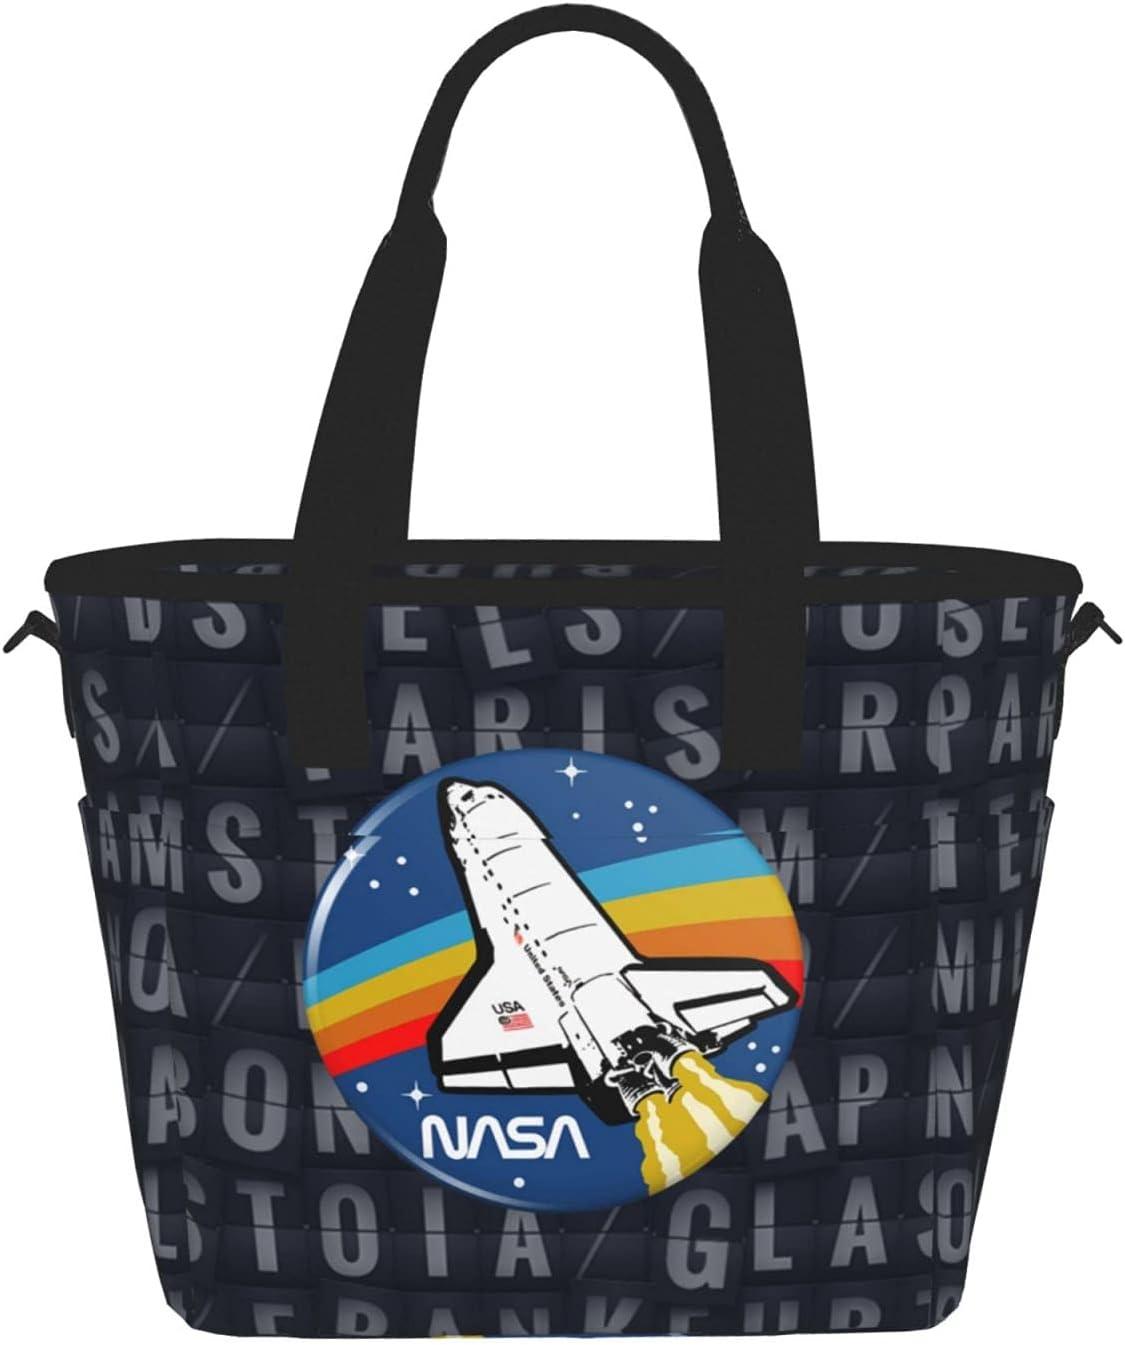 Nasa Retro Insulated Lunch Bag For Reusa Bags Women Kids Challenge ...